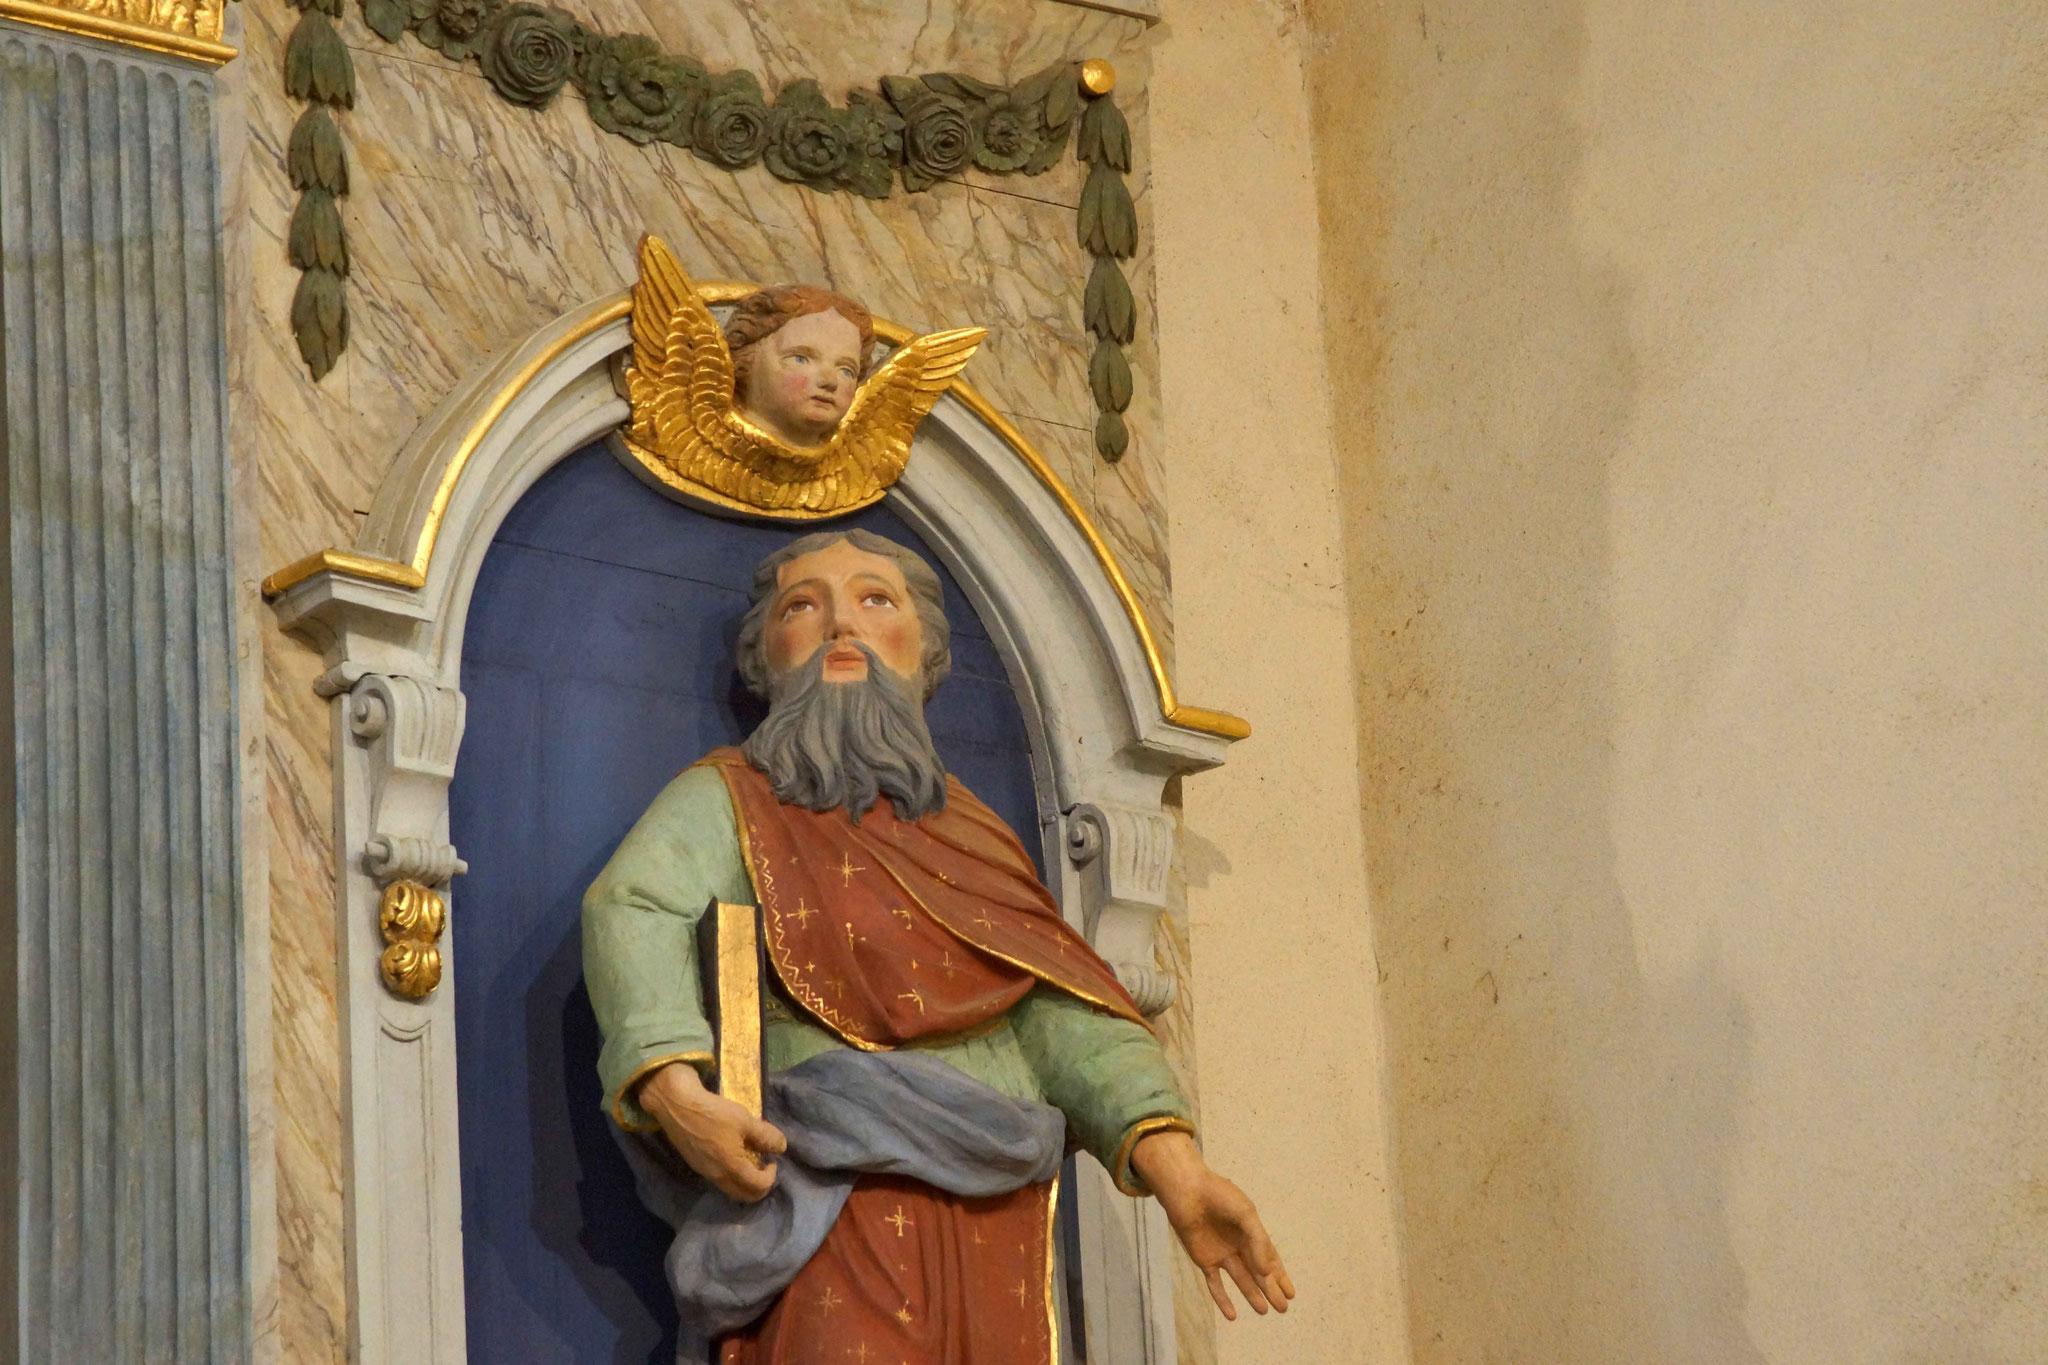 Chapelle de Liscorno, à Lannebert 8